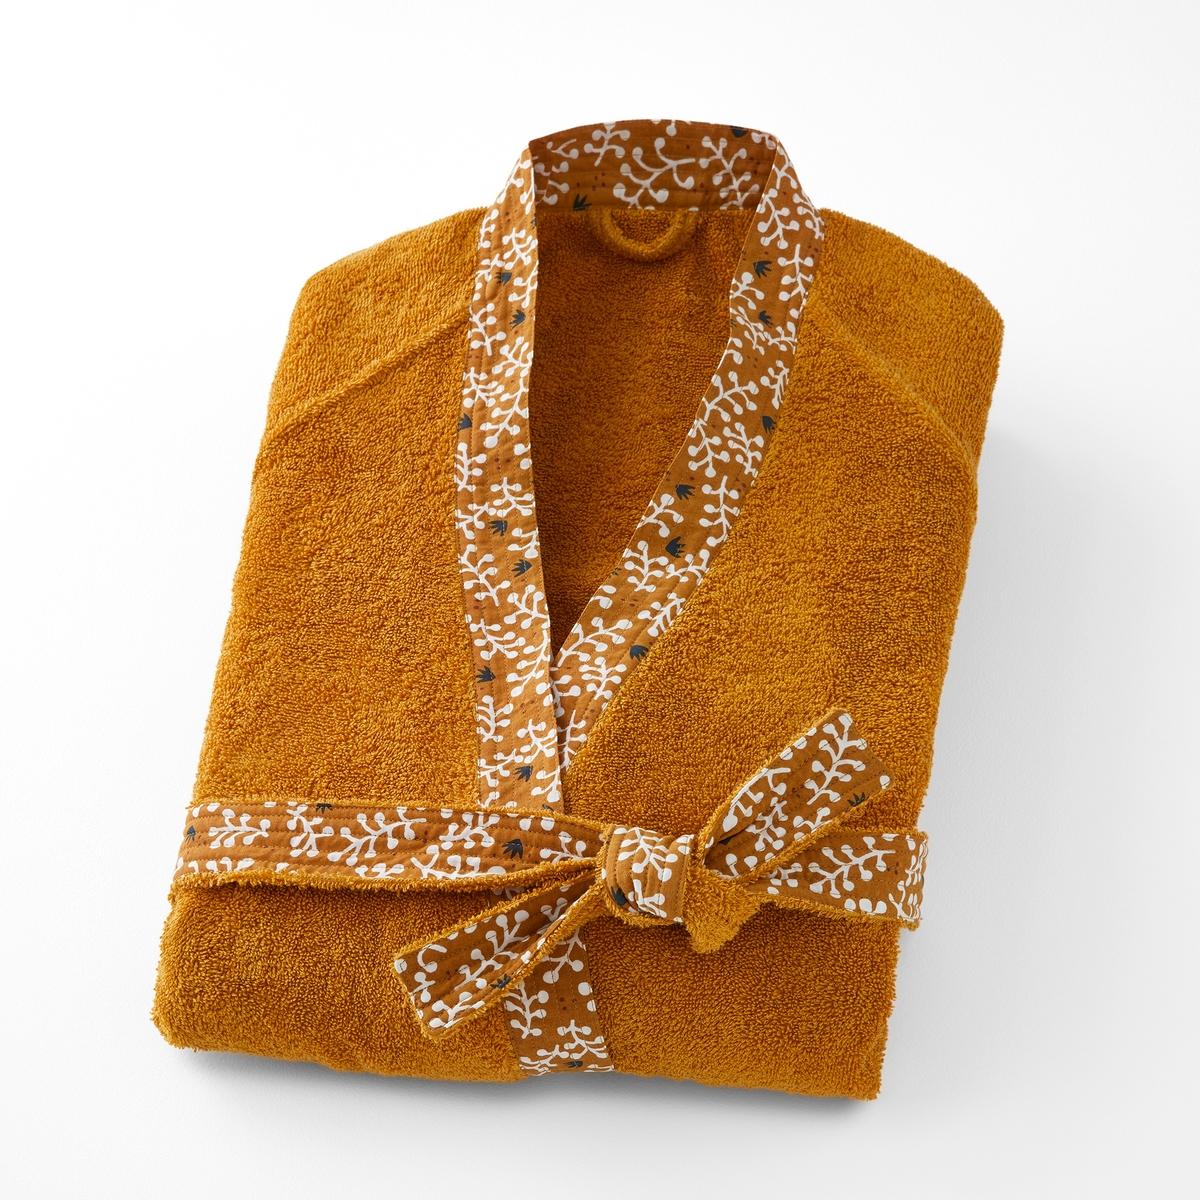 Accappatoio kimono spugna tessitura fantasia LONIE